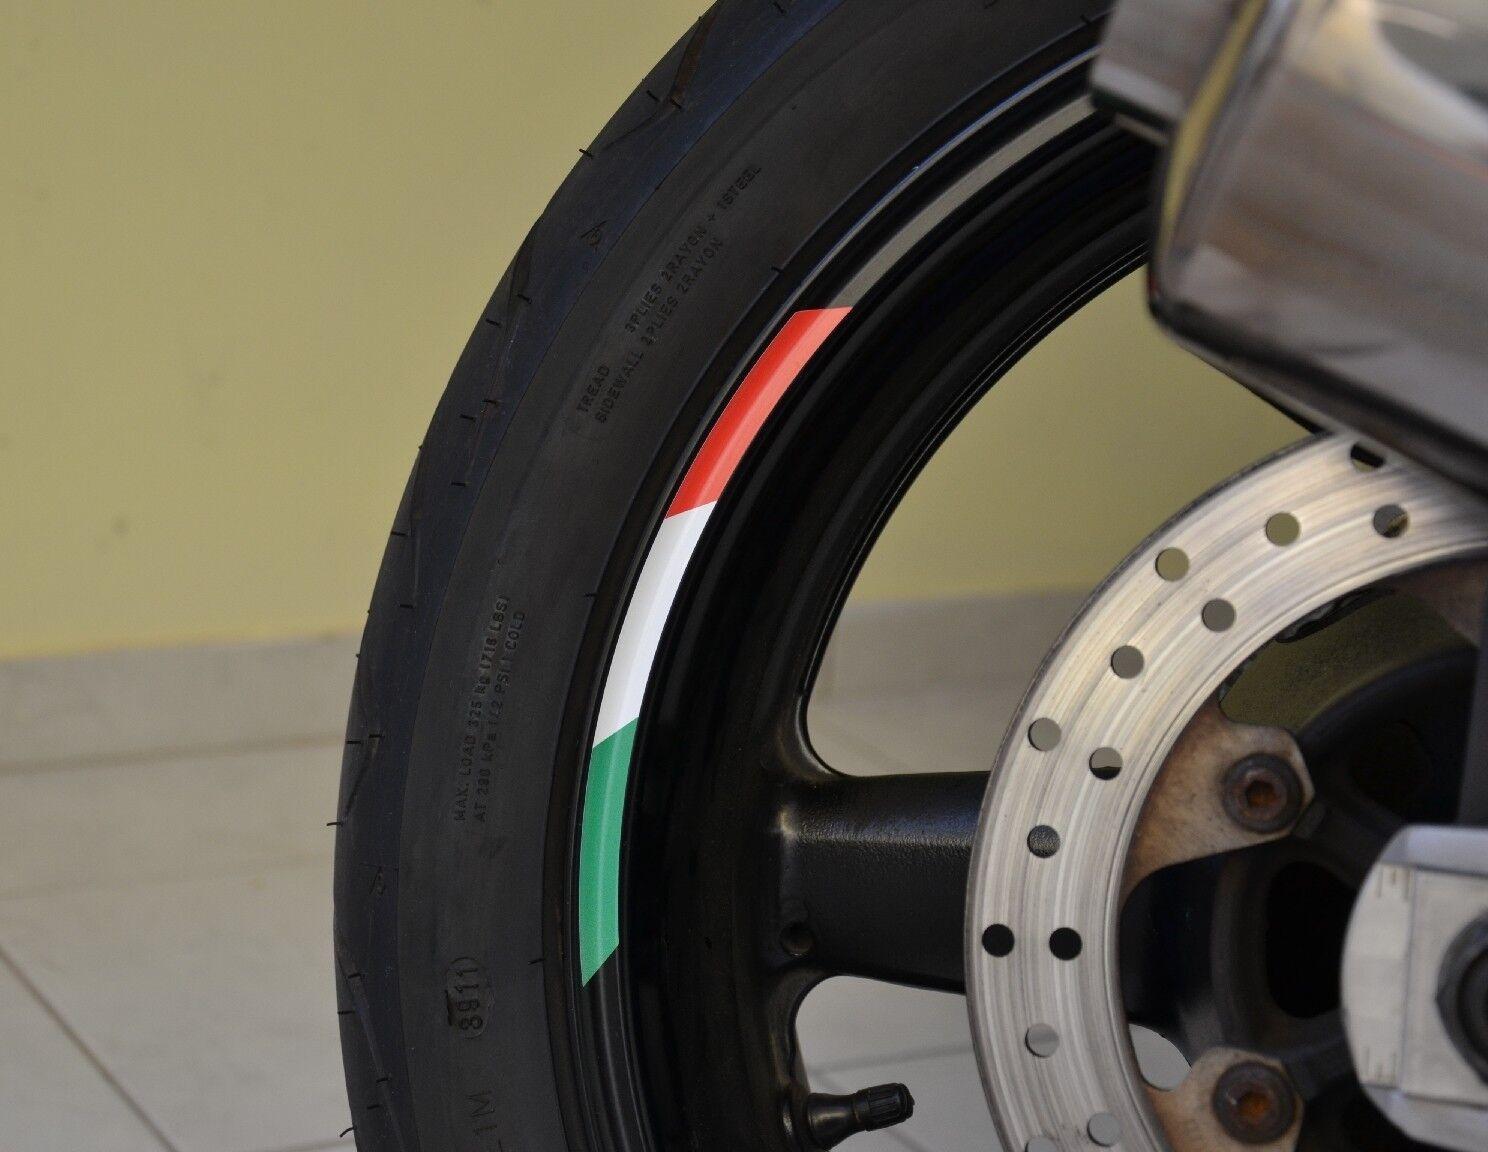 X Rims Wheels Italy Vinyl Sticker Stripes Flag Motorcycle Rim For - Vinyl stripes for motorcycles